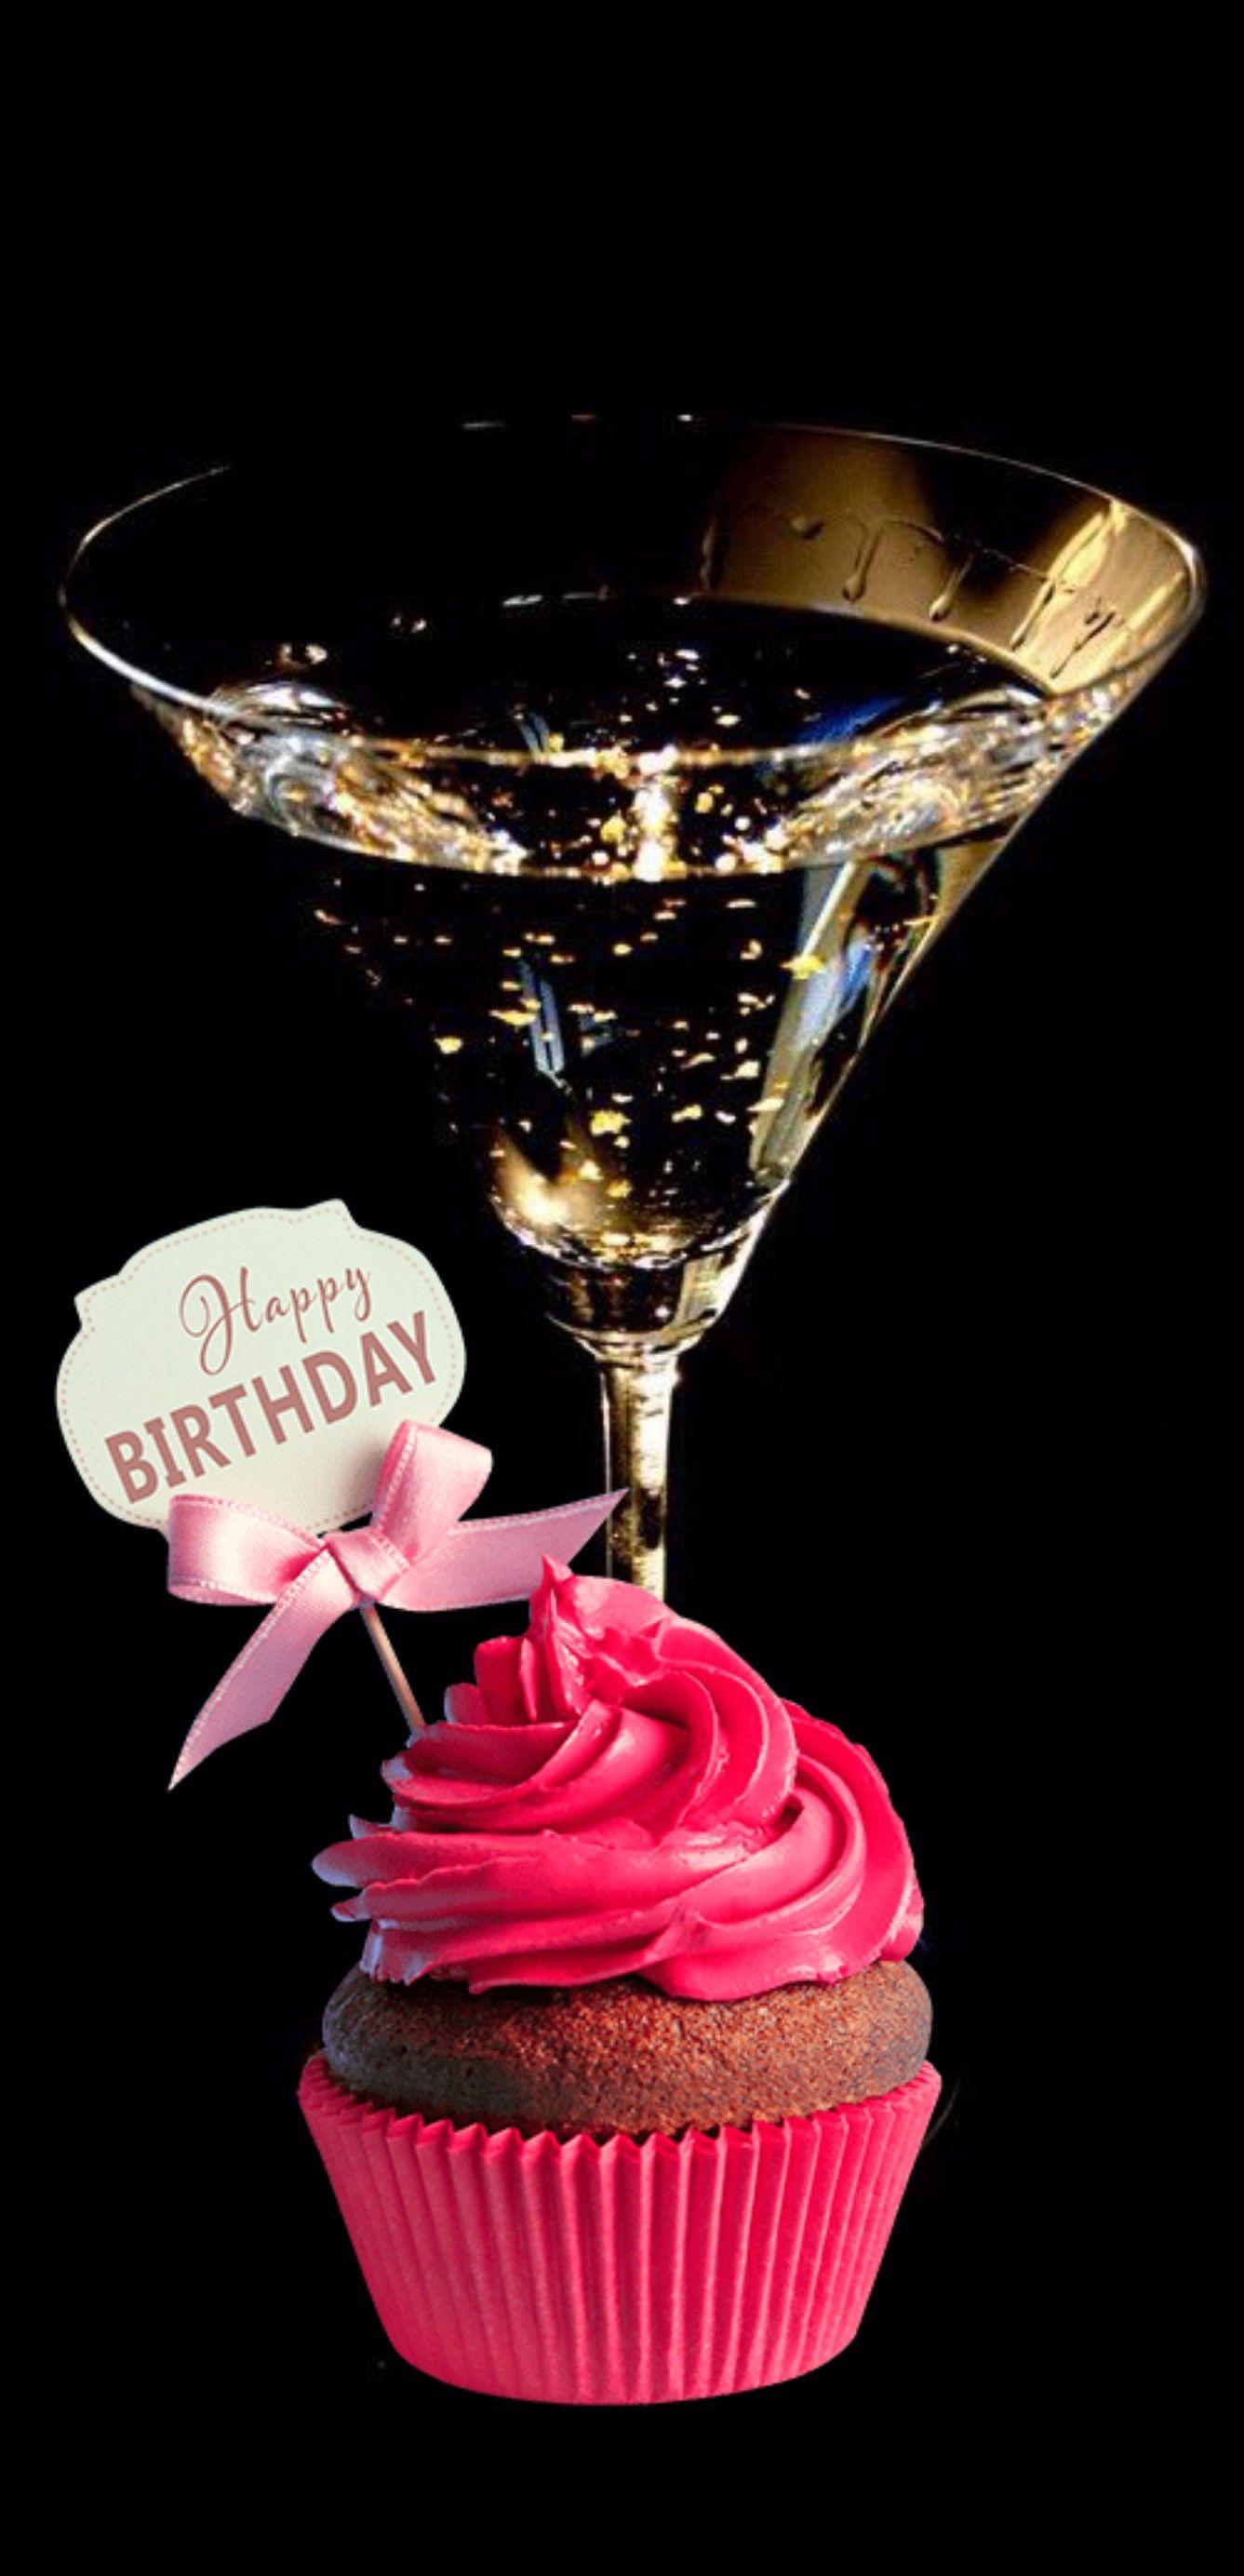 Happy Birthday Cupcake And Champagne Happy Birthday Cakes Happy Birthday Cupcakes Happy